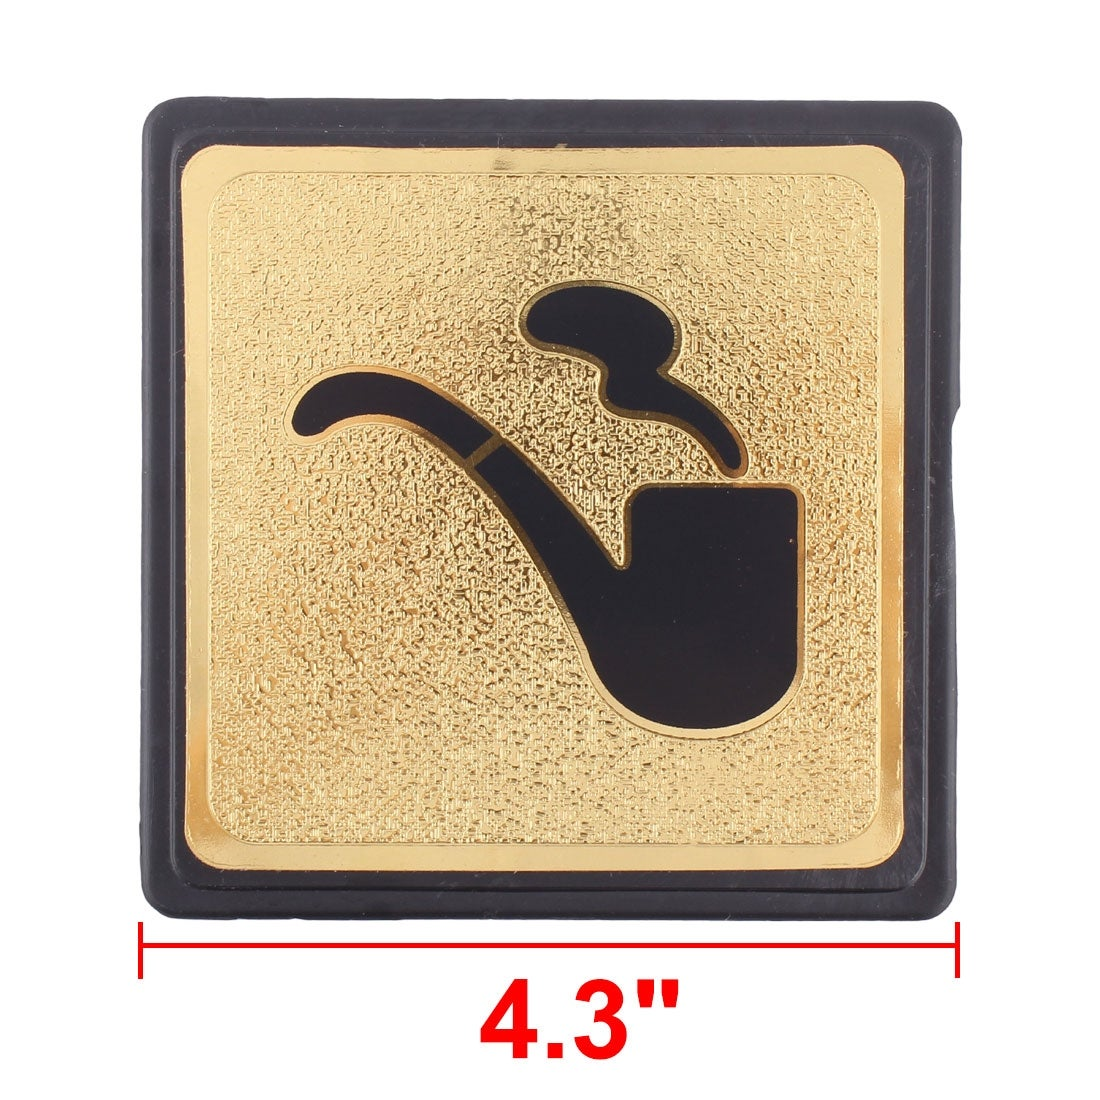 Black Gold Tone Plastic Smoking Sign Board w Adhesive Tape - Free ...